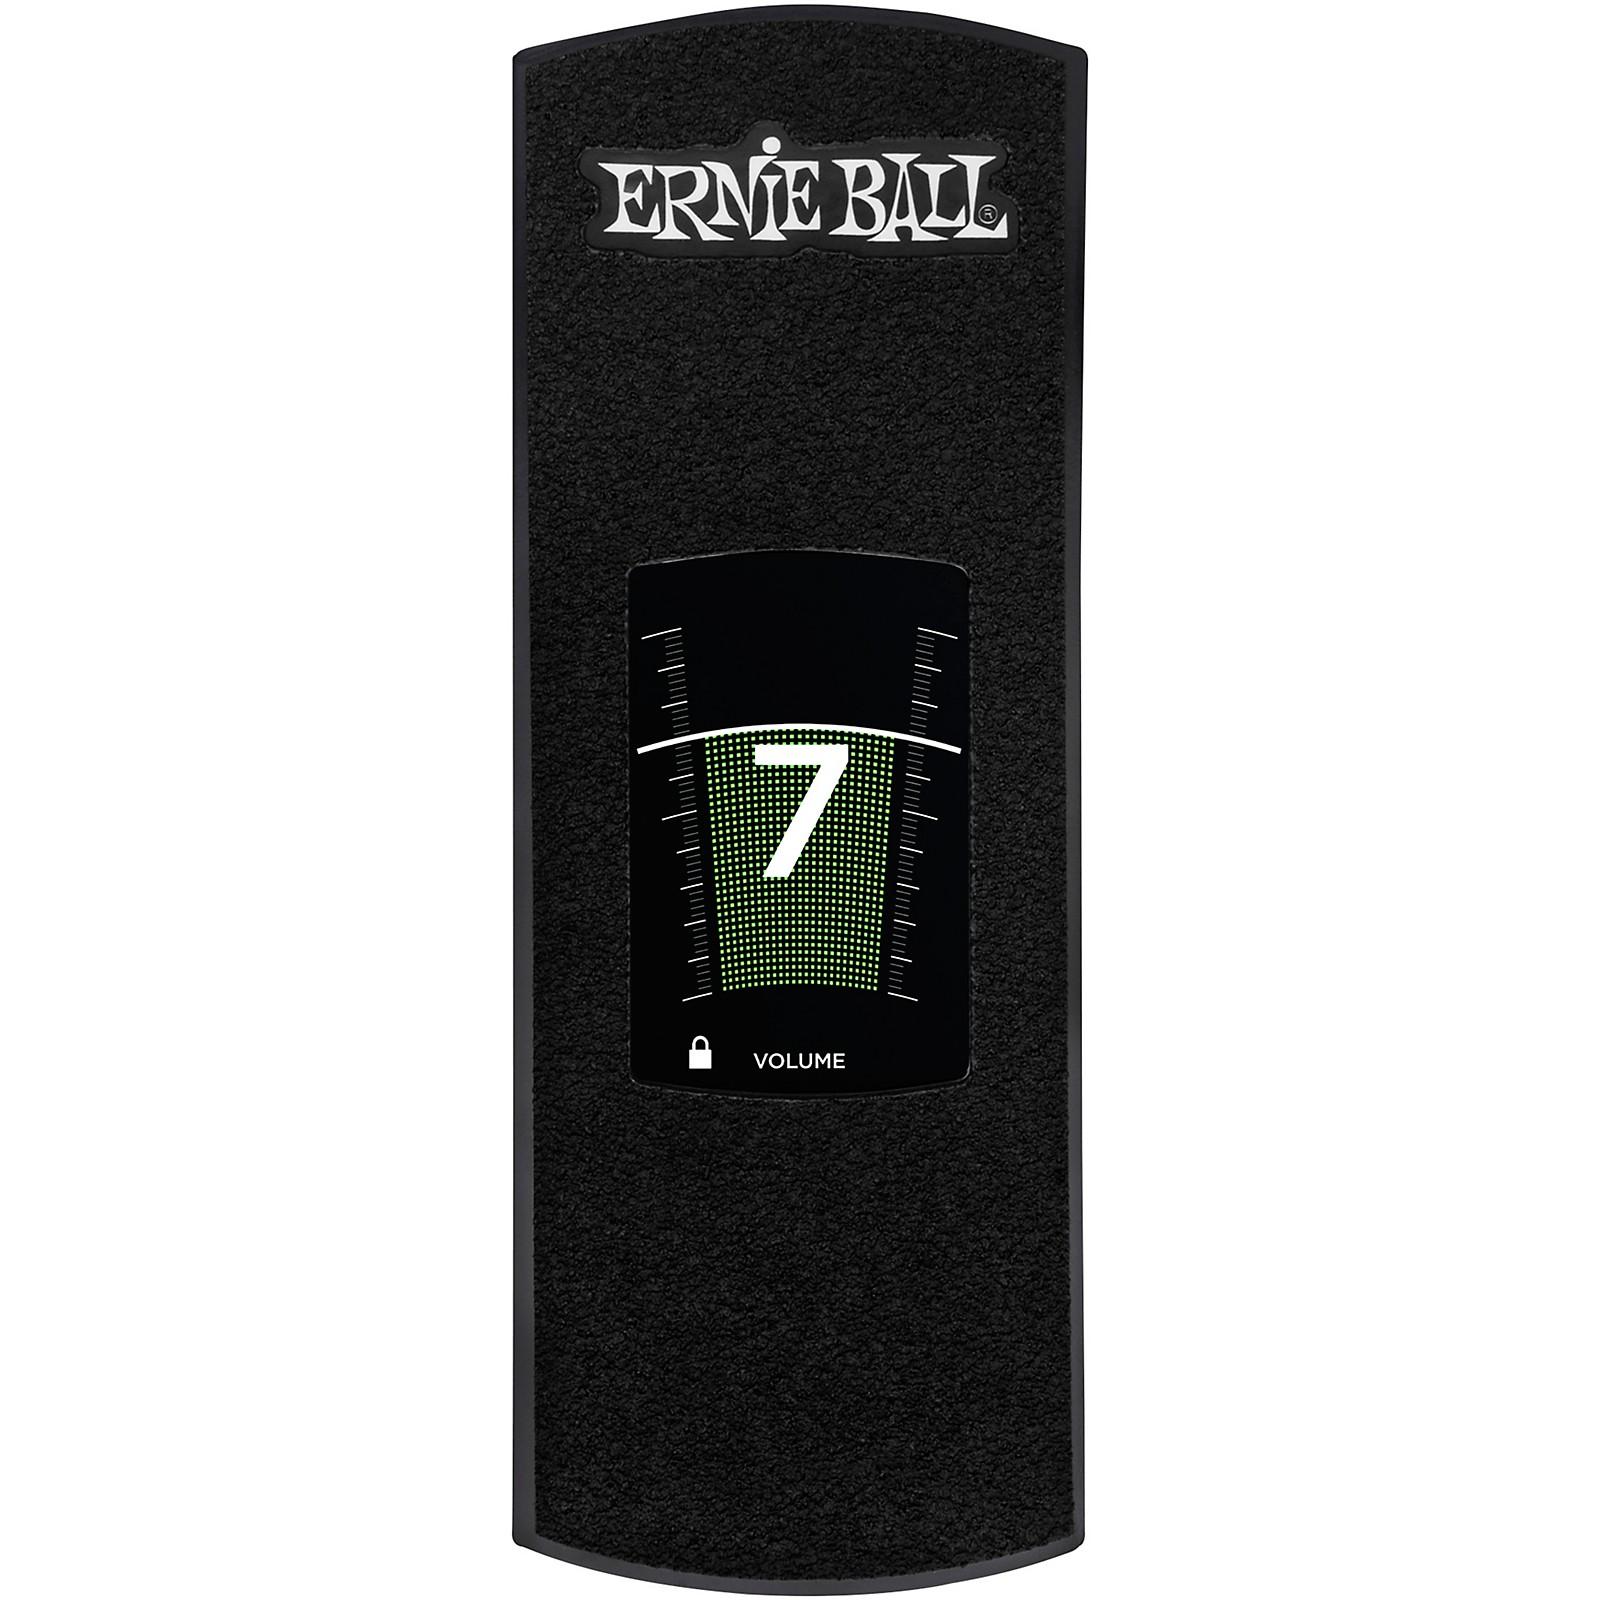 Ernie Ball VPJR Tuner Volume Pedal